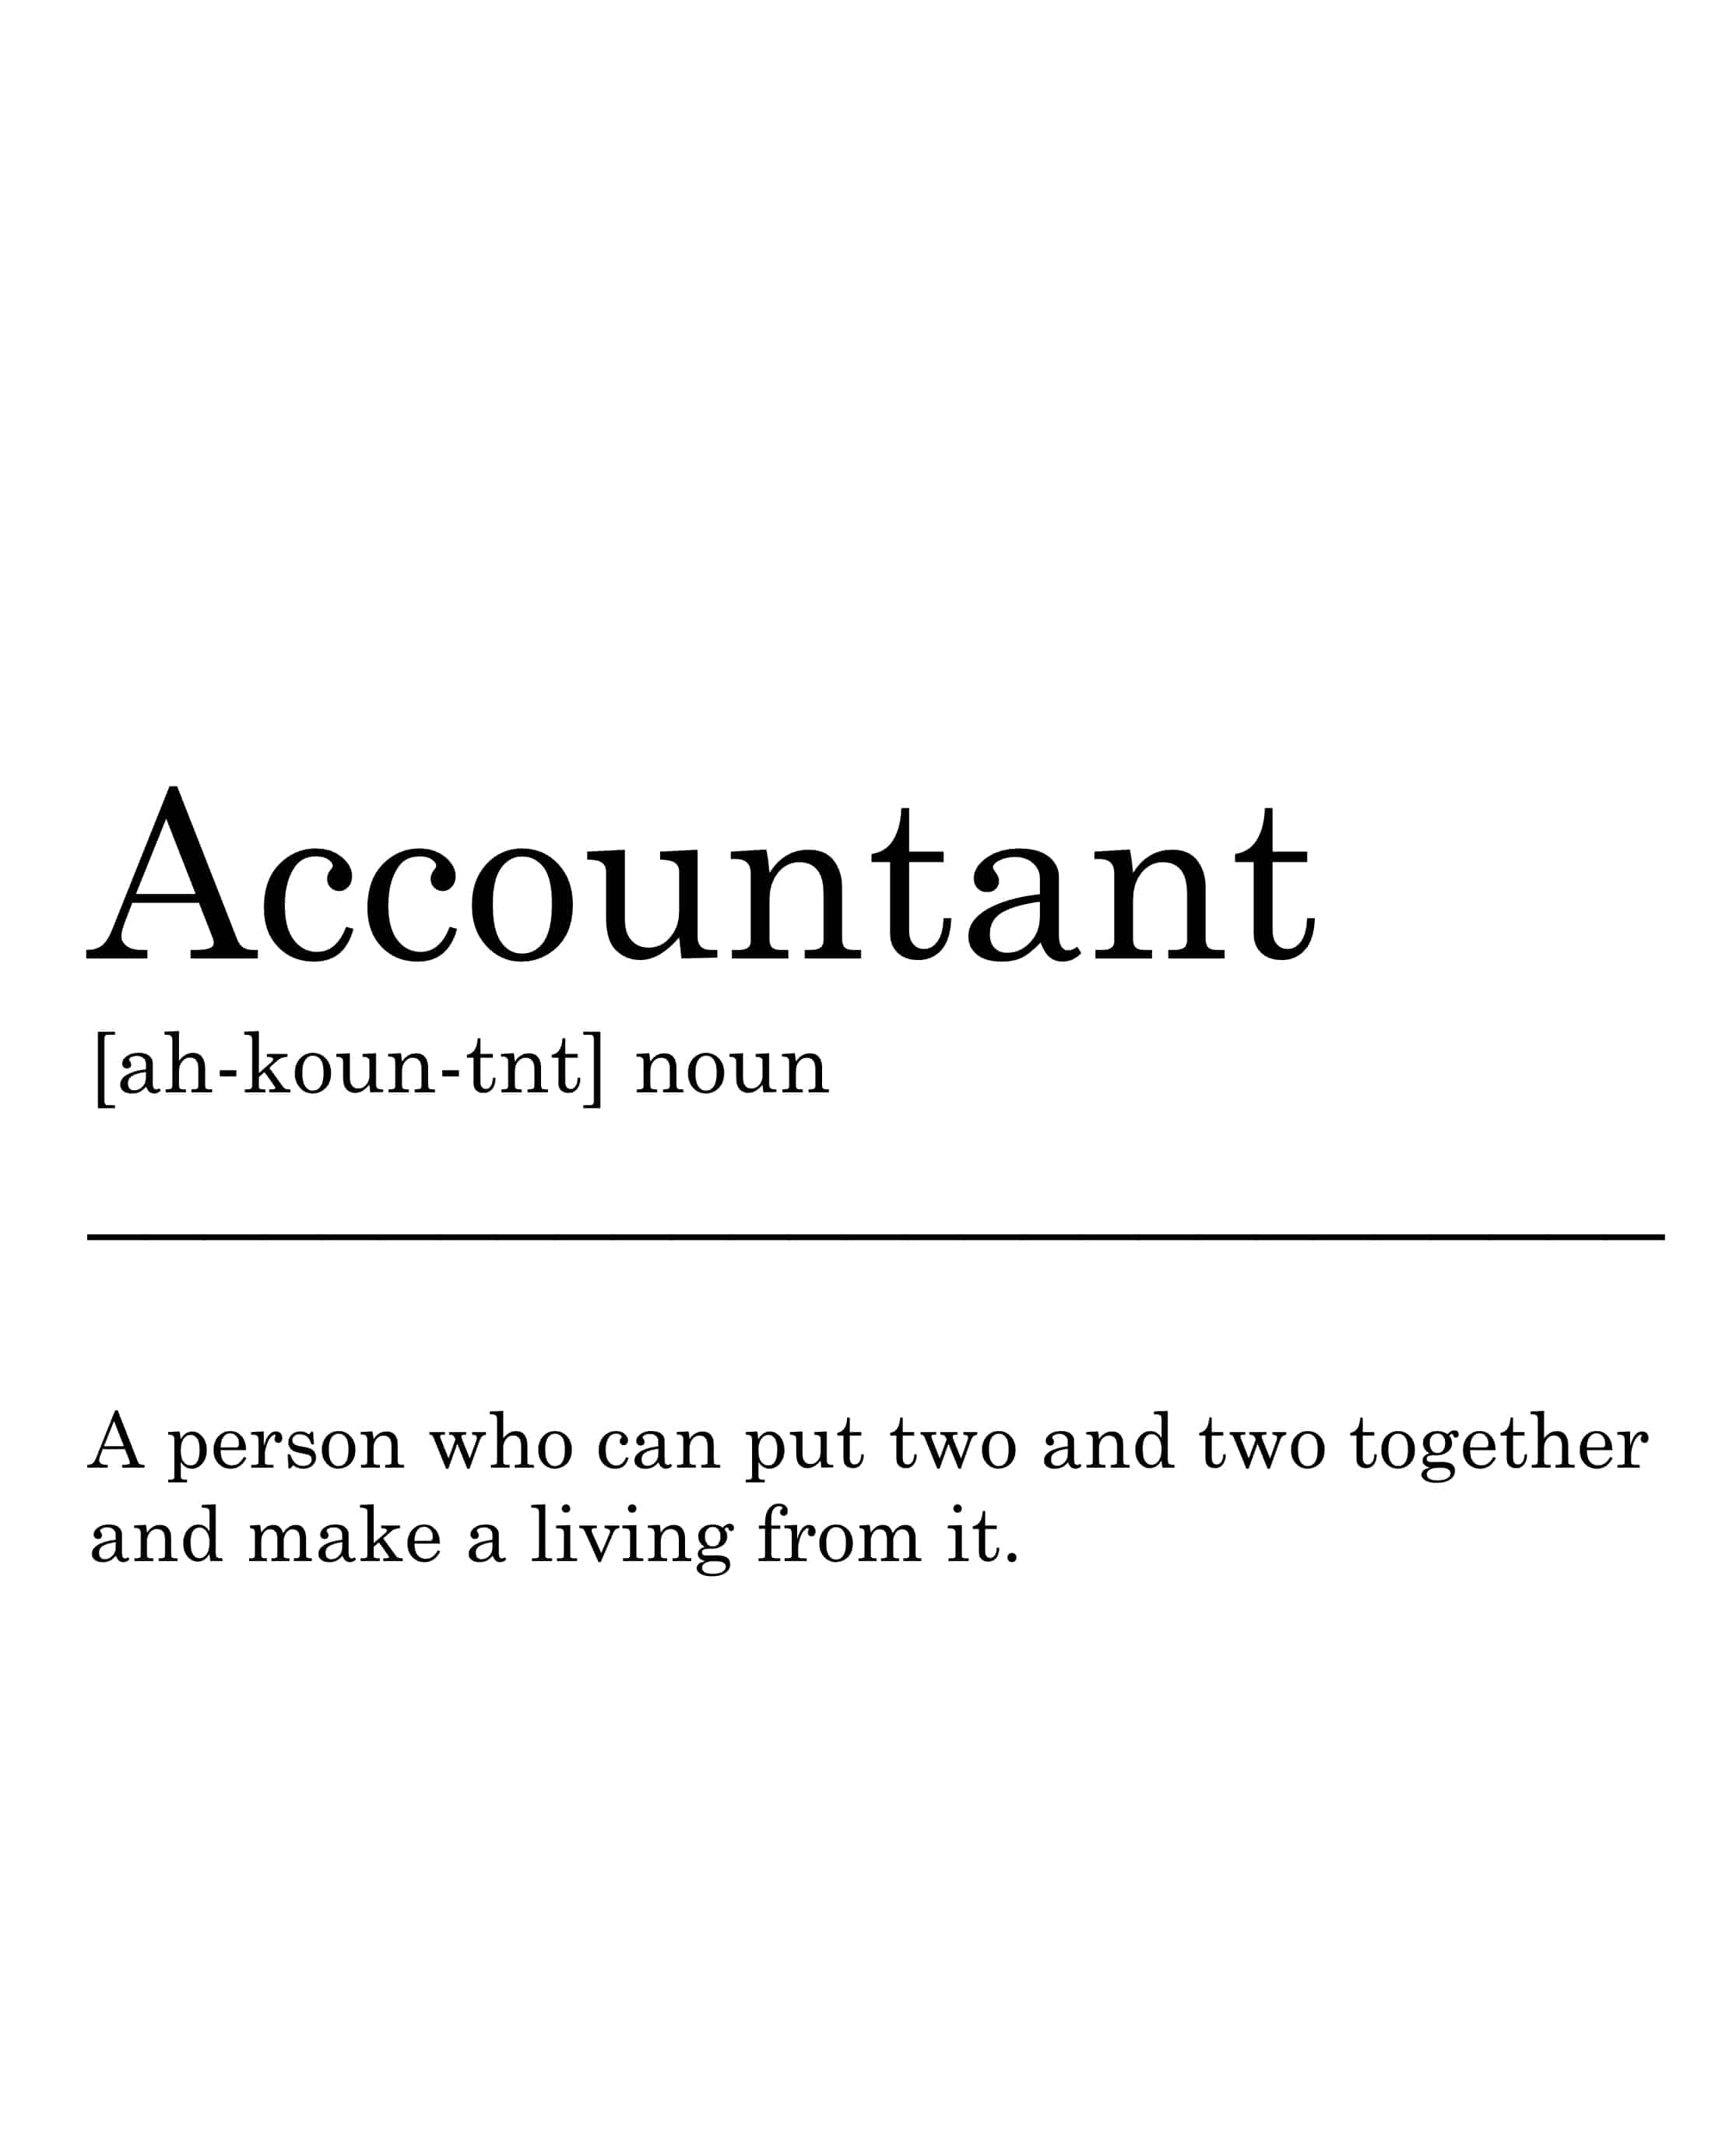 accountant definition printable wall art for you to print